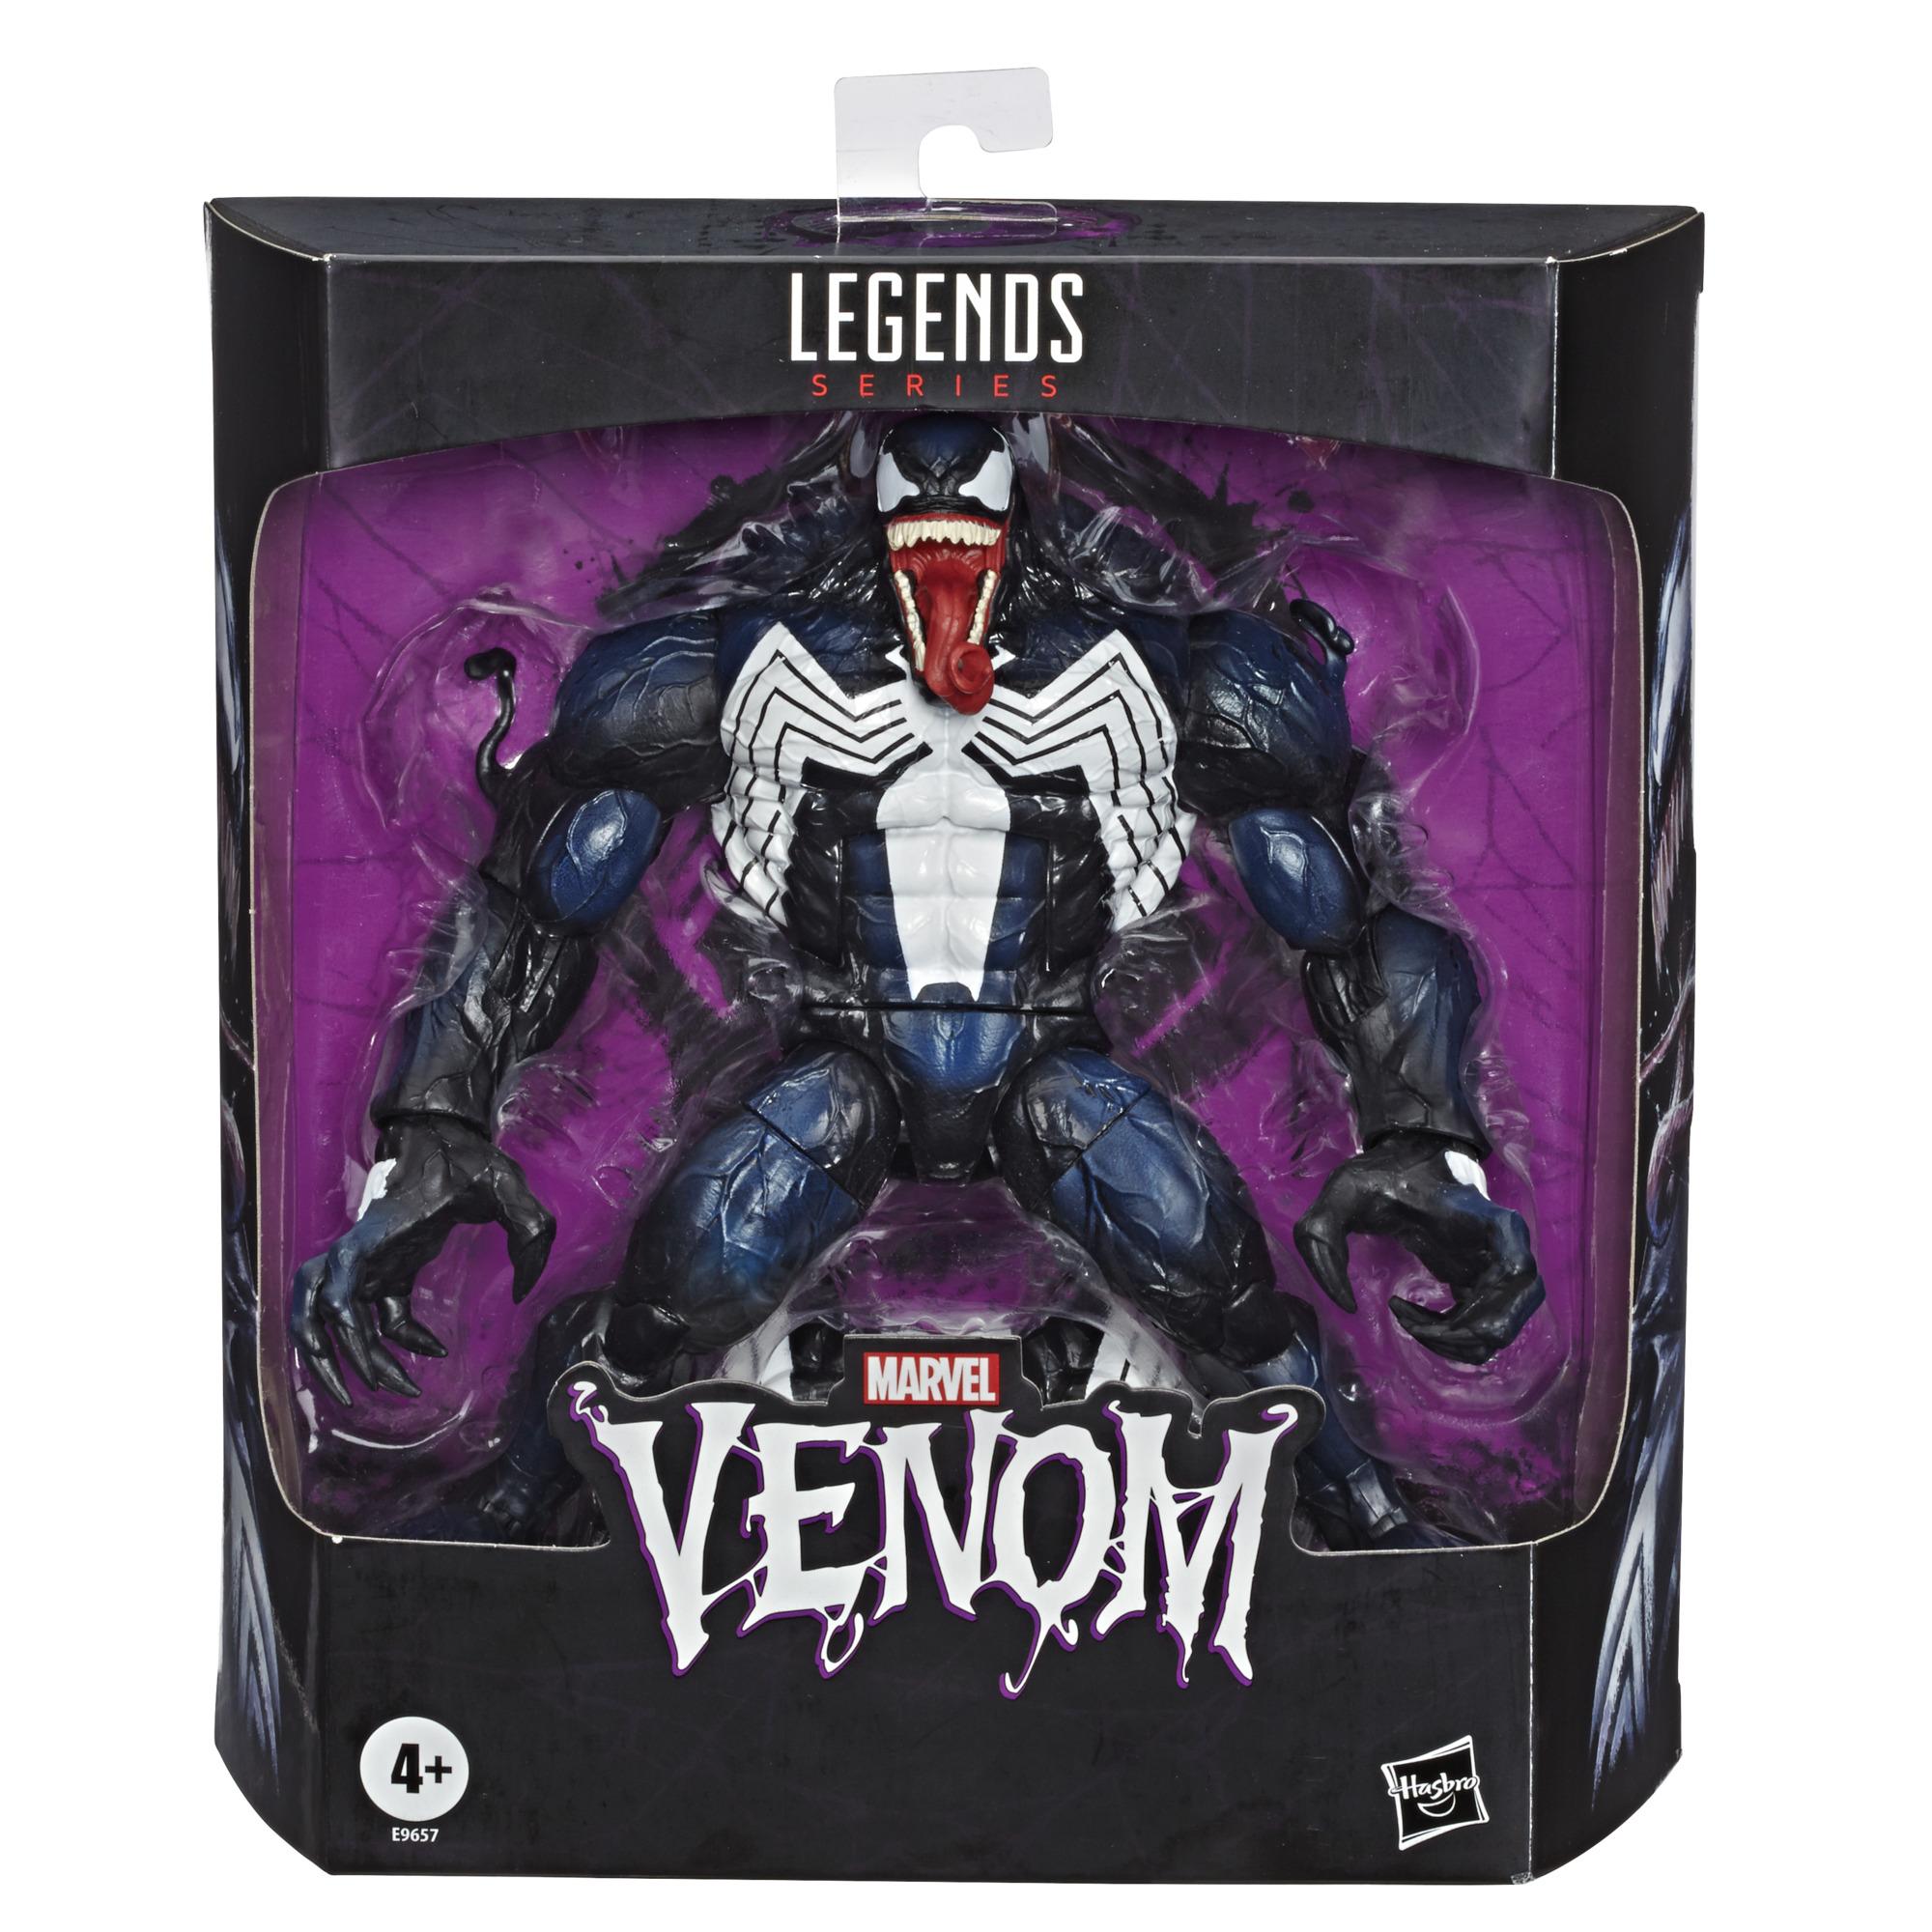 E96575L00 Venom Legends series pkg